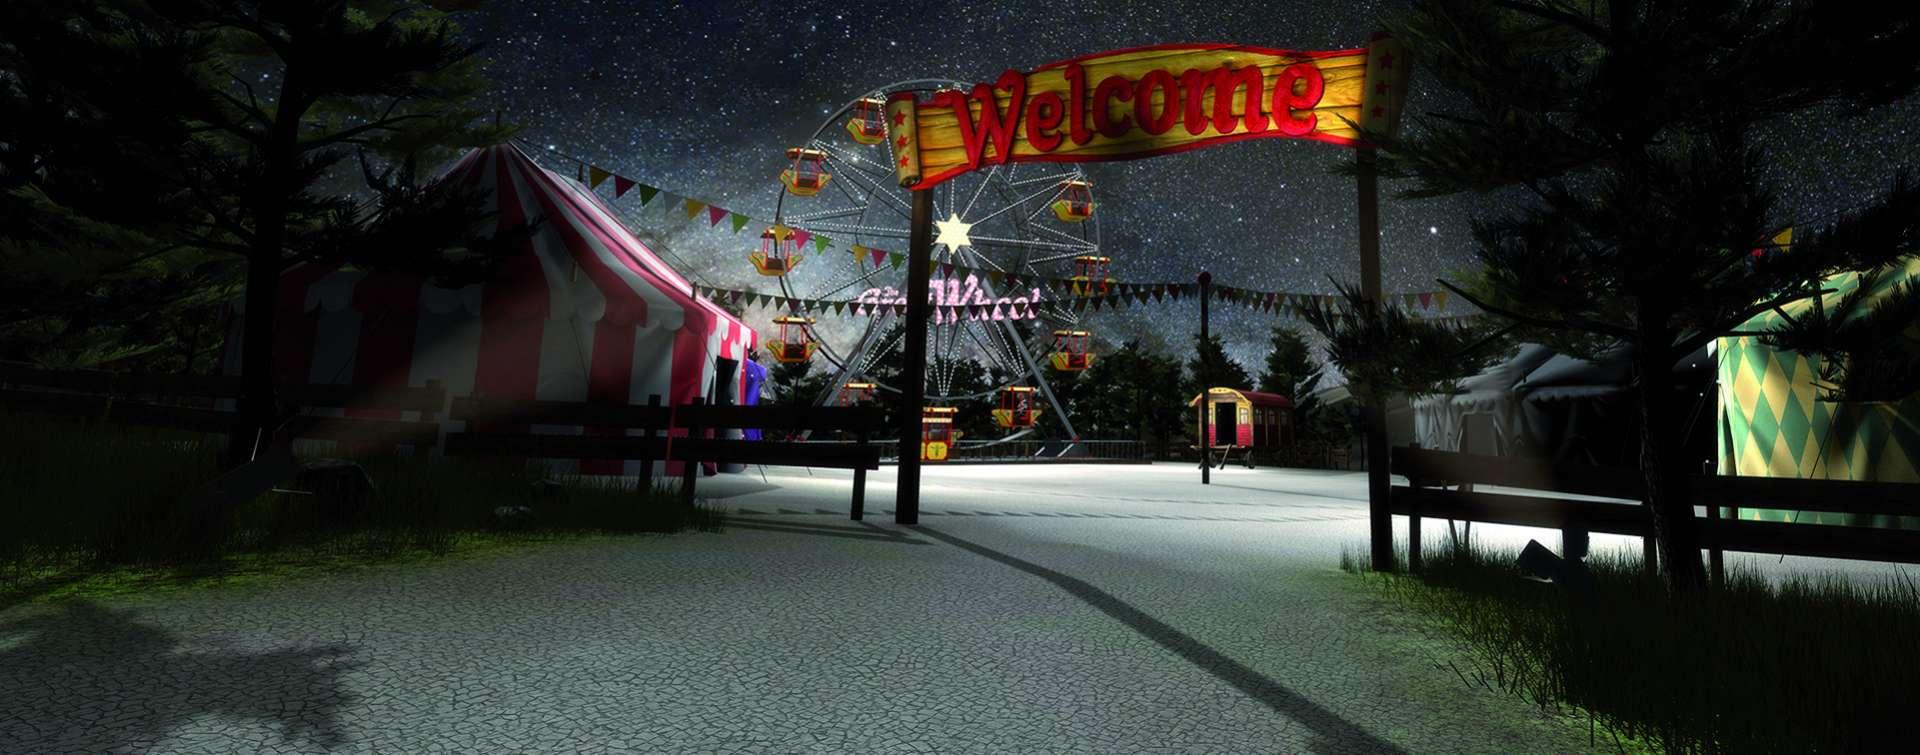 Naufrage. Un jeu vidéo interactif de Thomas Daveluy.